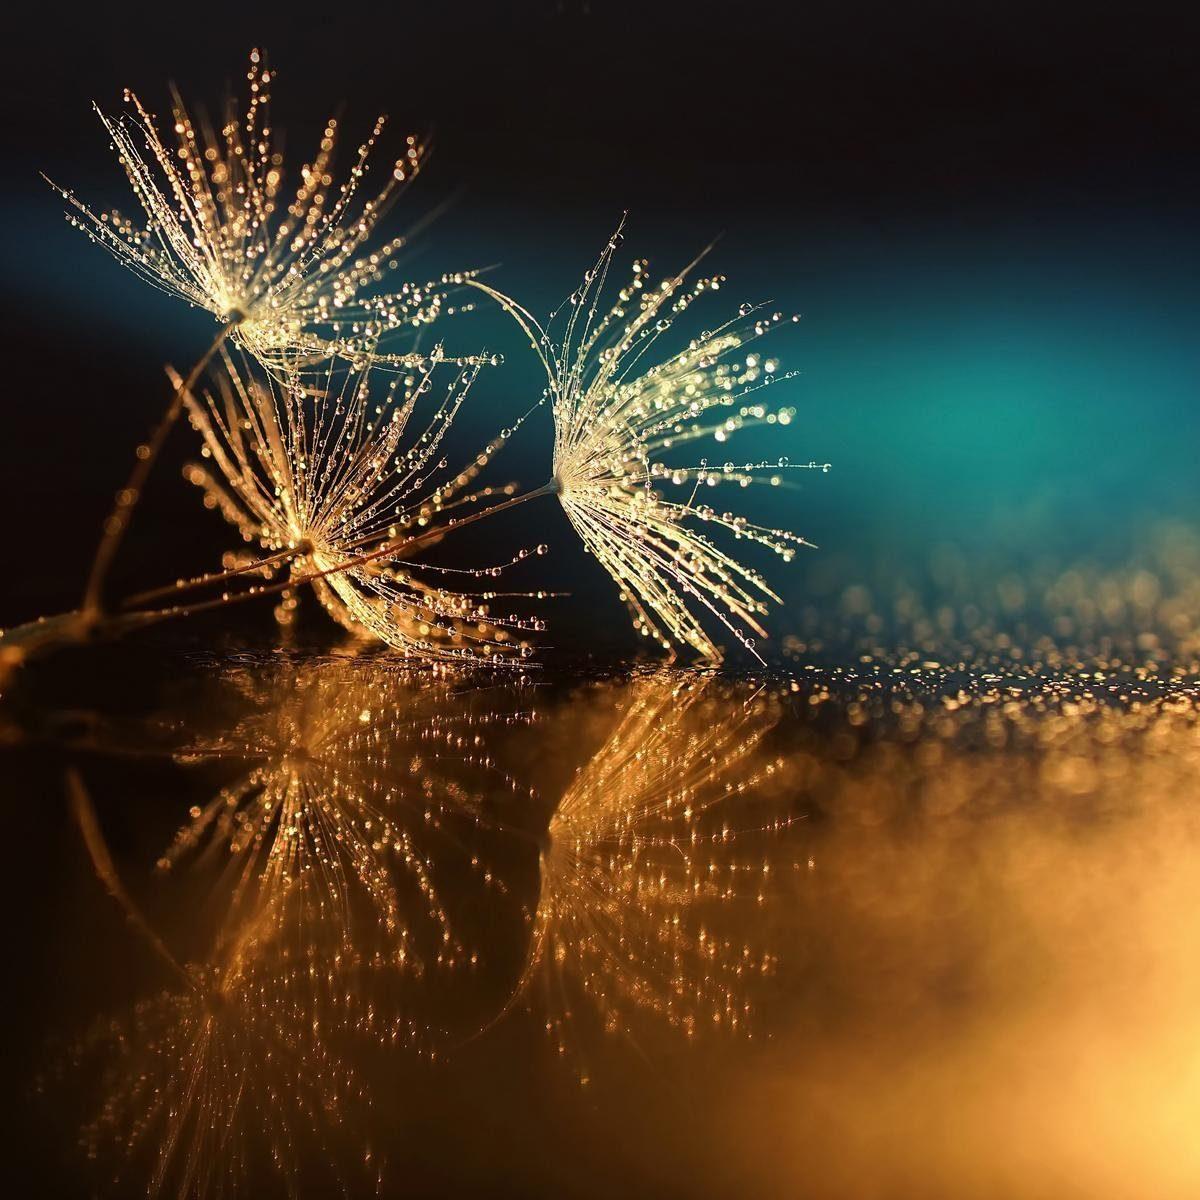 EUROGRAPHICS Glasbild »Dandelion Seeds«, 50/50 cm